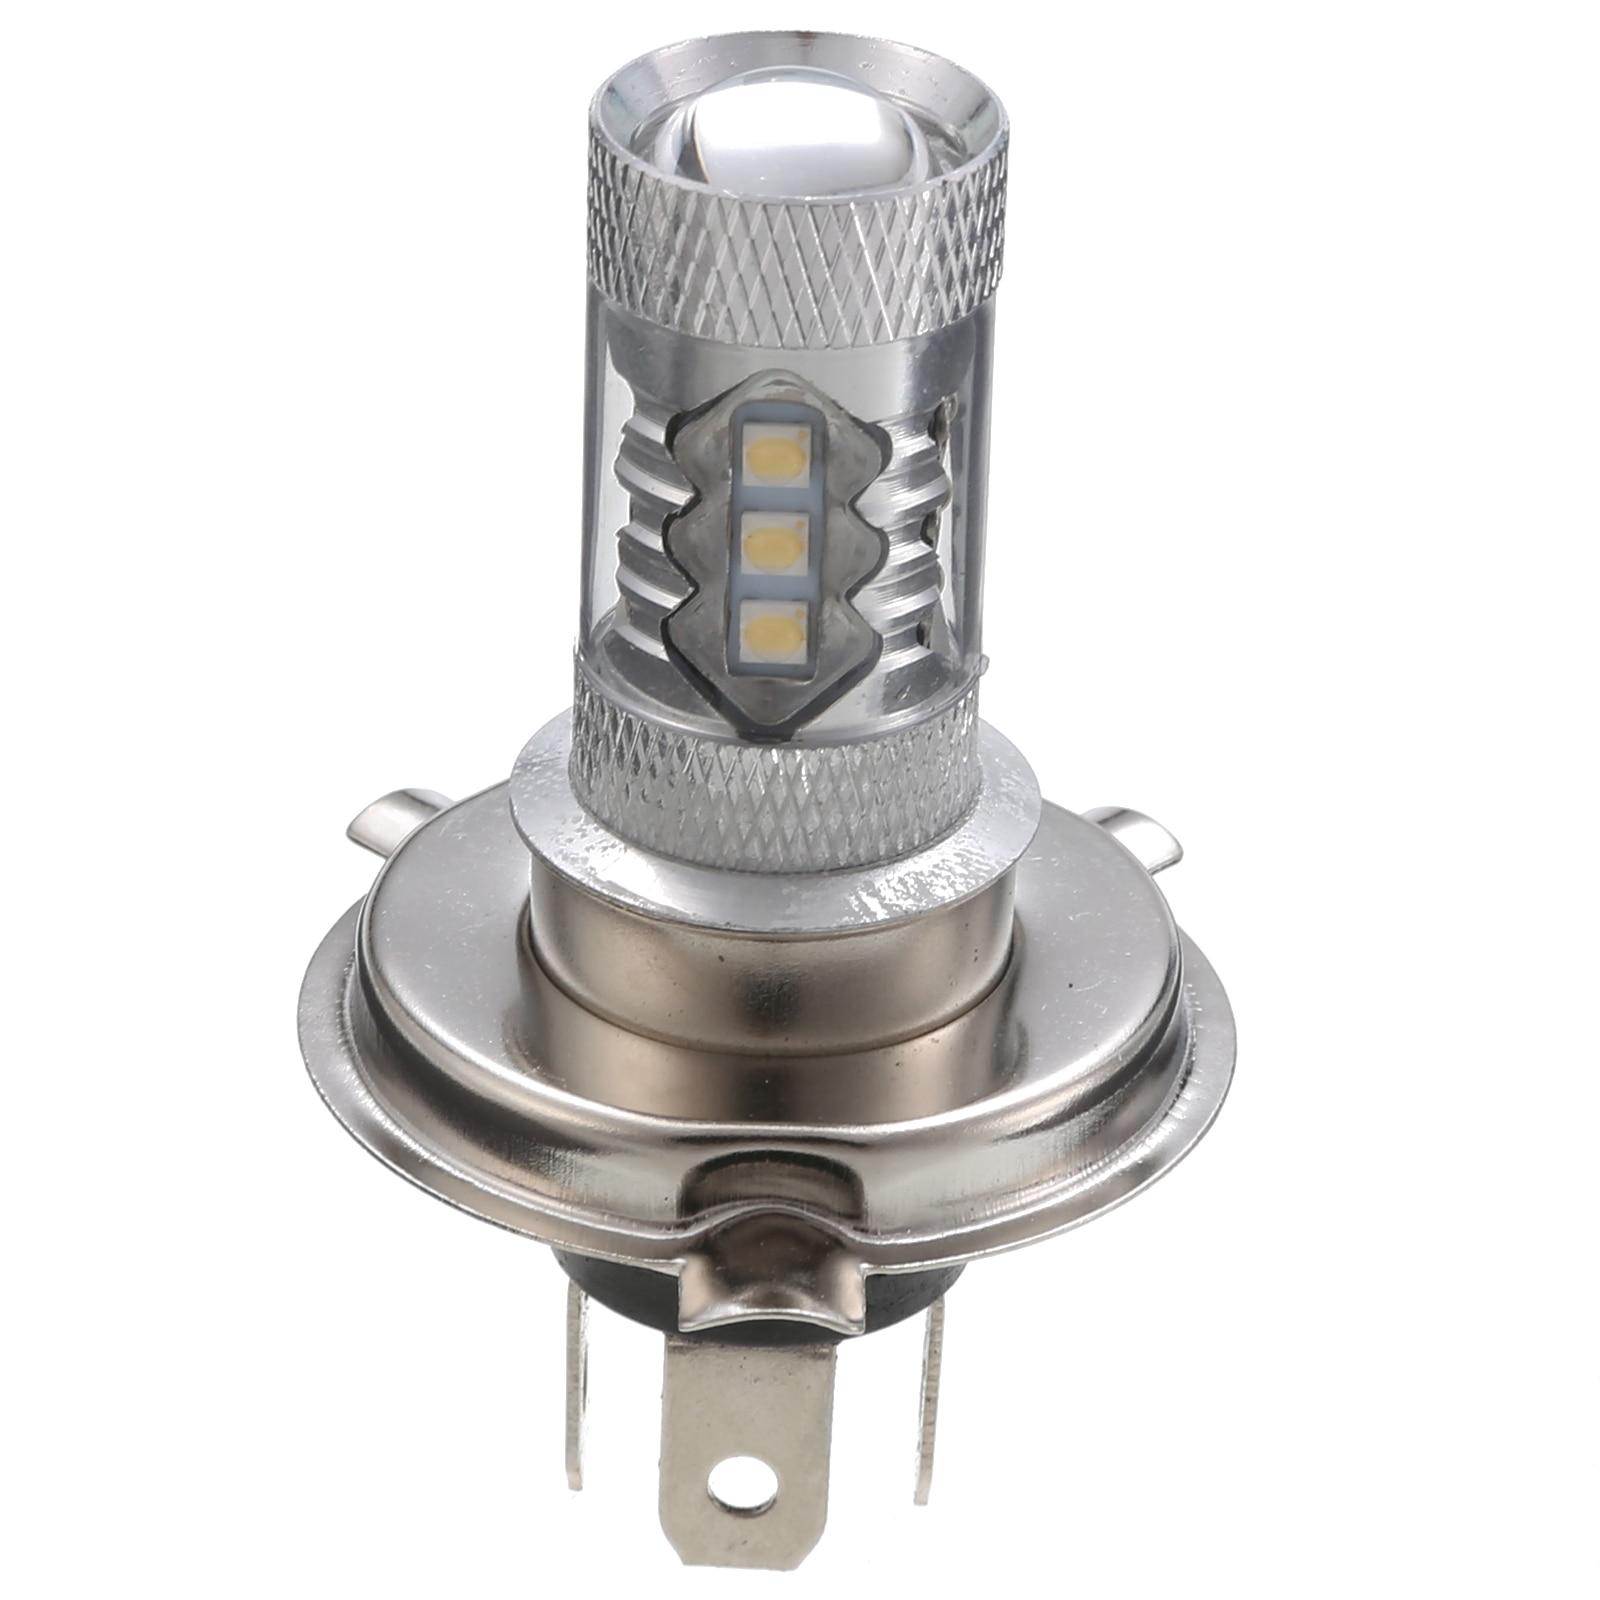 1pc H4 80W 800LM 12V Motorcycle LED HeadLight H/L Beam Head Lamp Bulb White Low Power